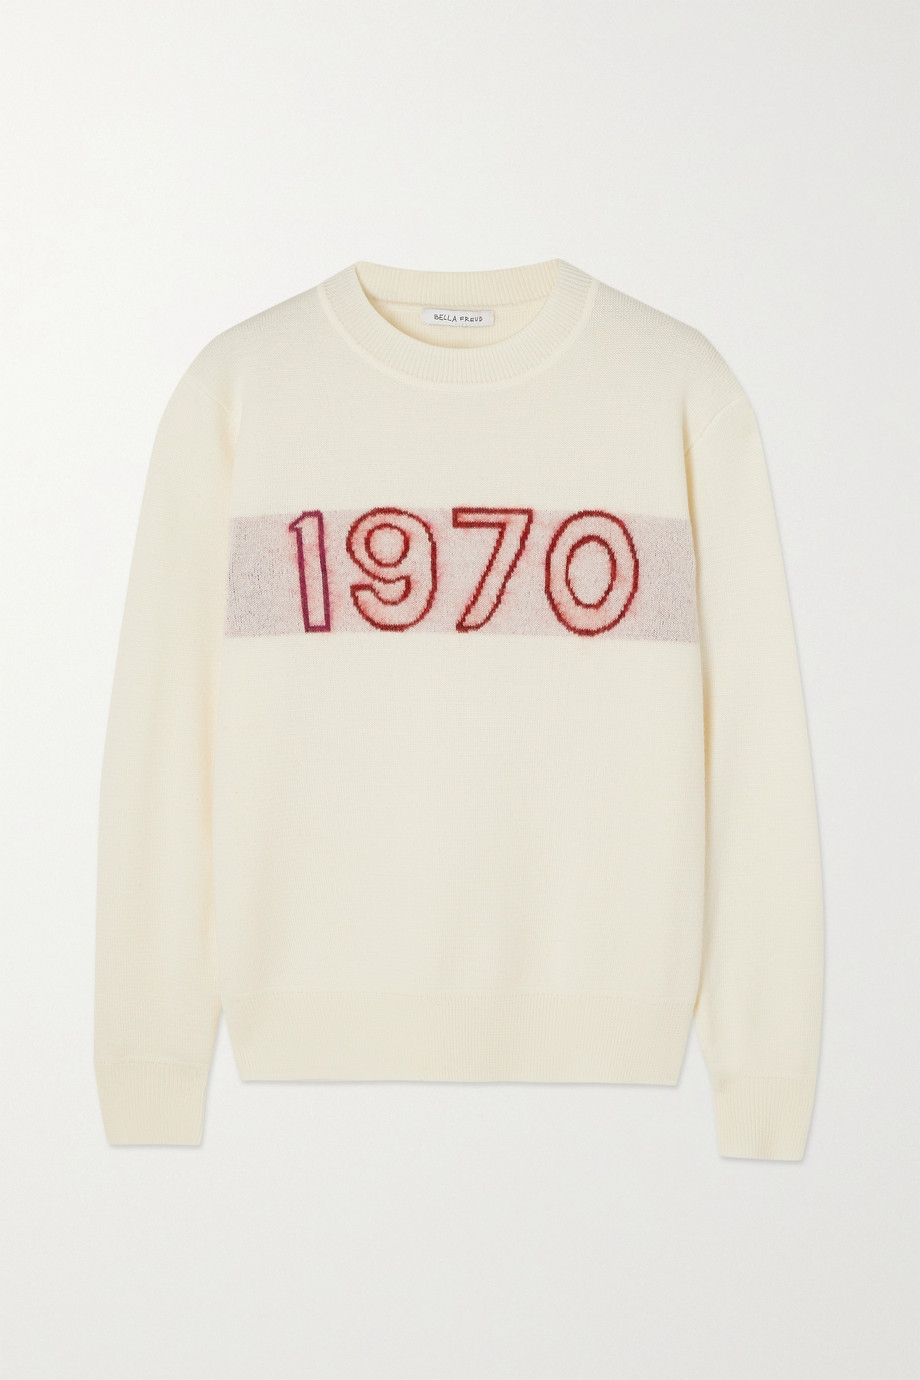 Bella Freud Pull en laine mélangée intarsia 1970 Glow